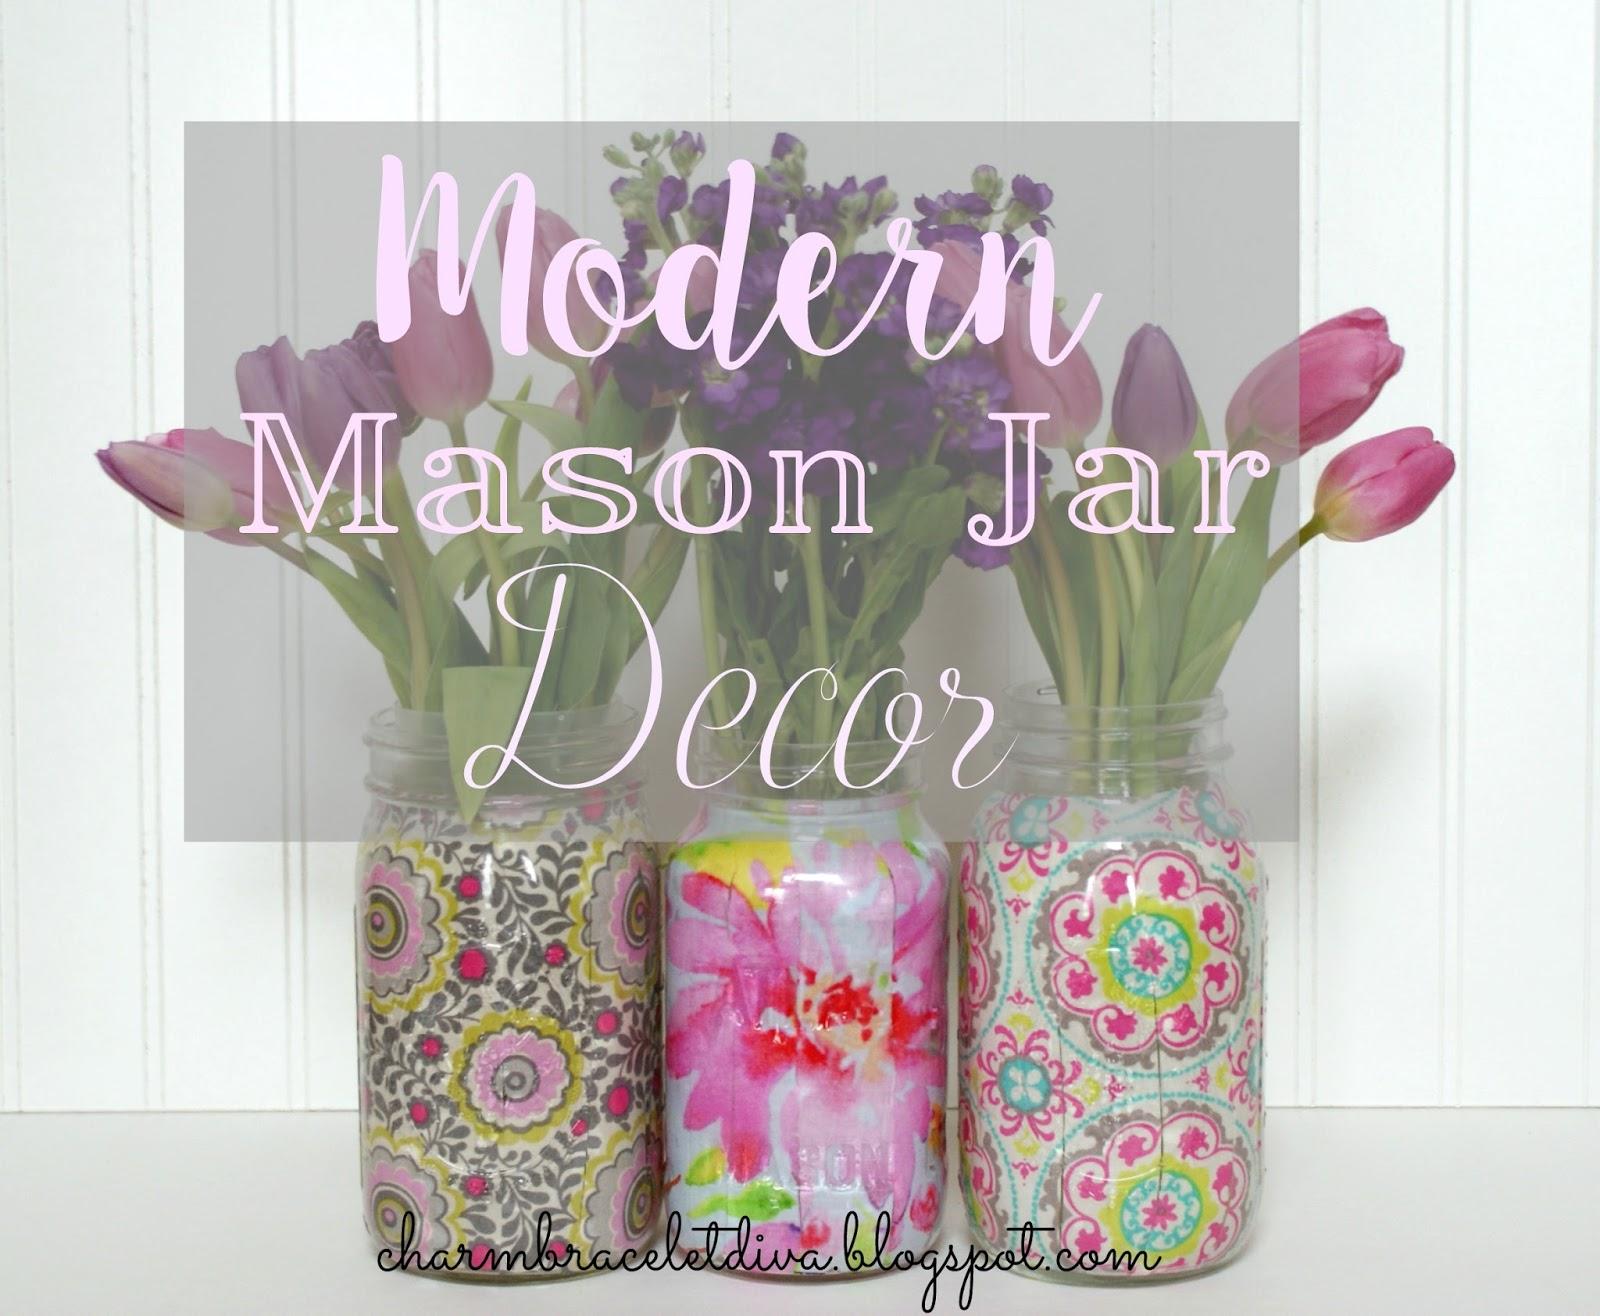 Our hopeful home modern mason jar decor diy modern mason jar vase using fabric and mod podge reviewsmspy